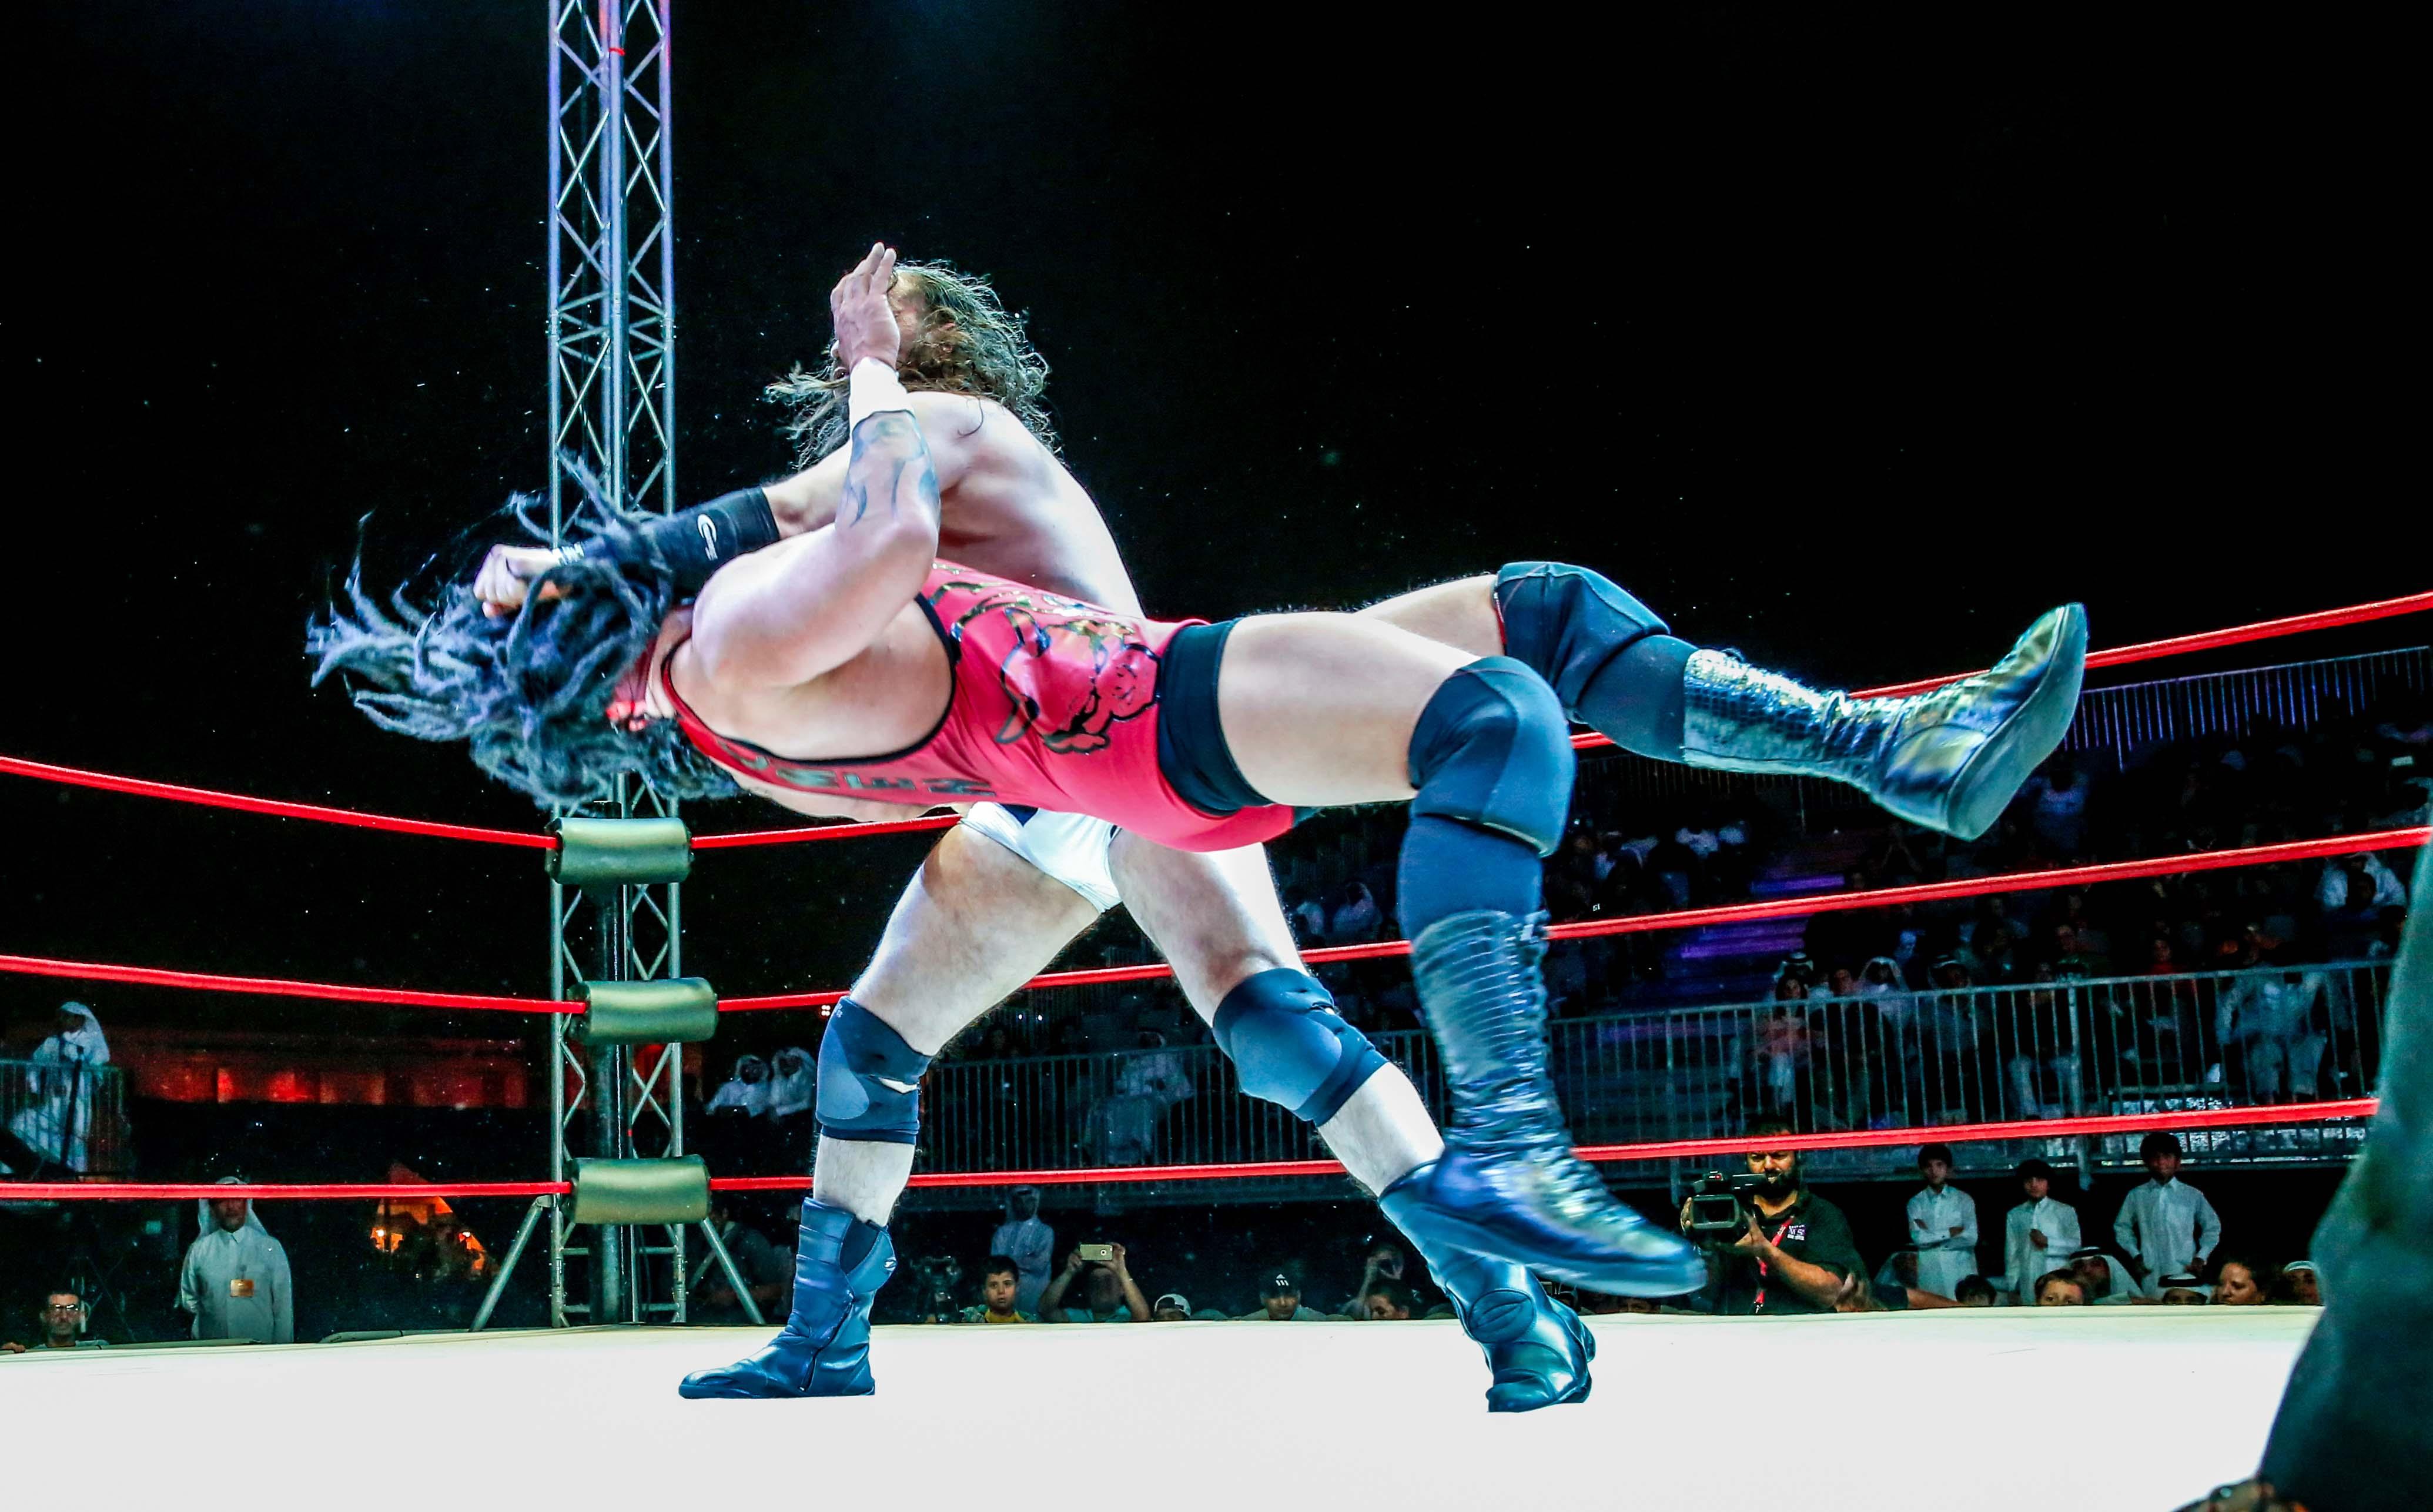 pro wrestling a worldwide phenomenon Pro wrestling worldwide 22,183 likes 246 talking about this everything pro wrestling worldwide.